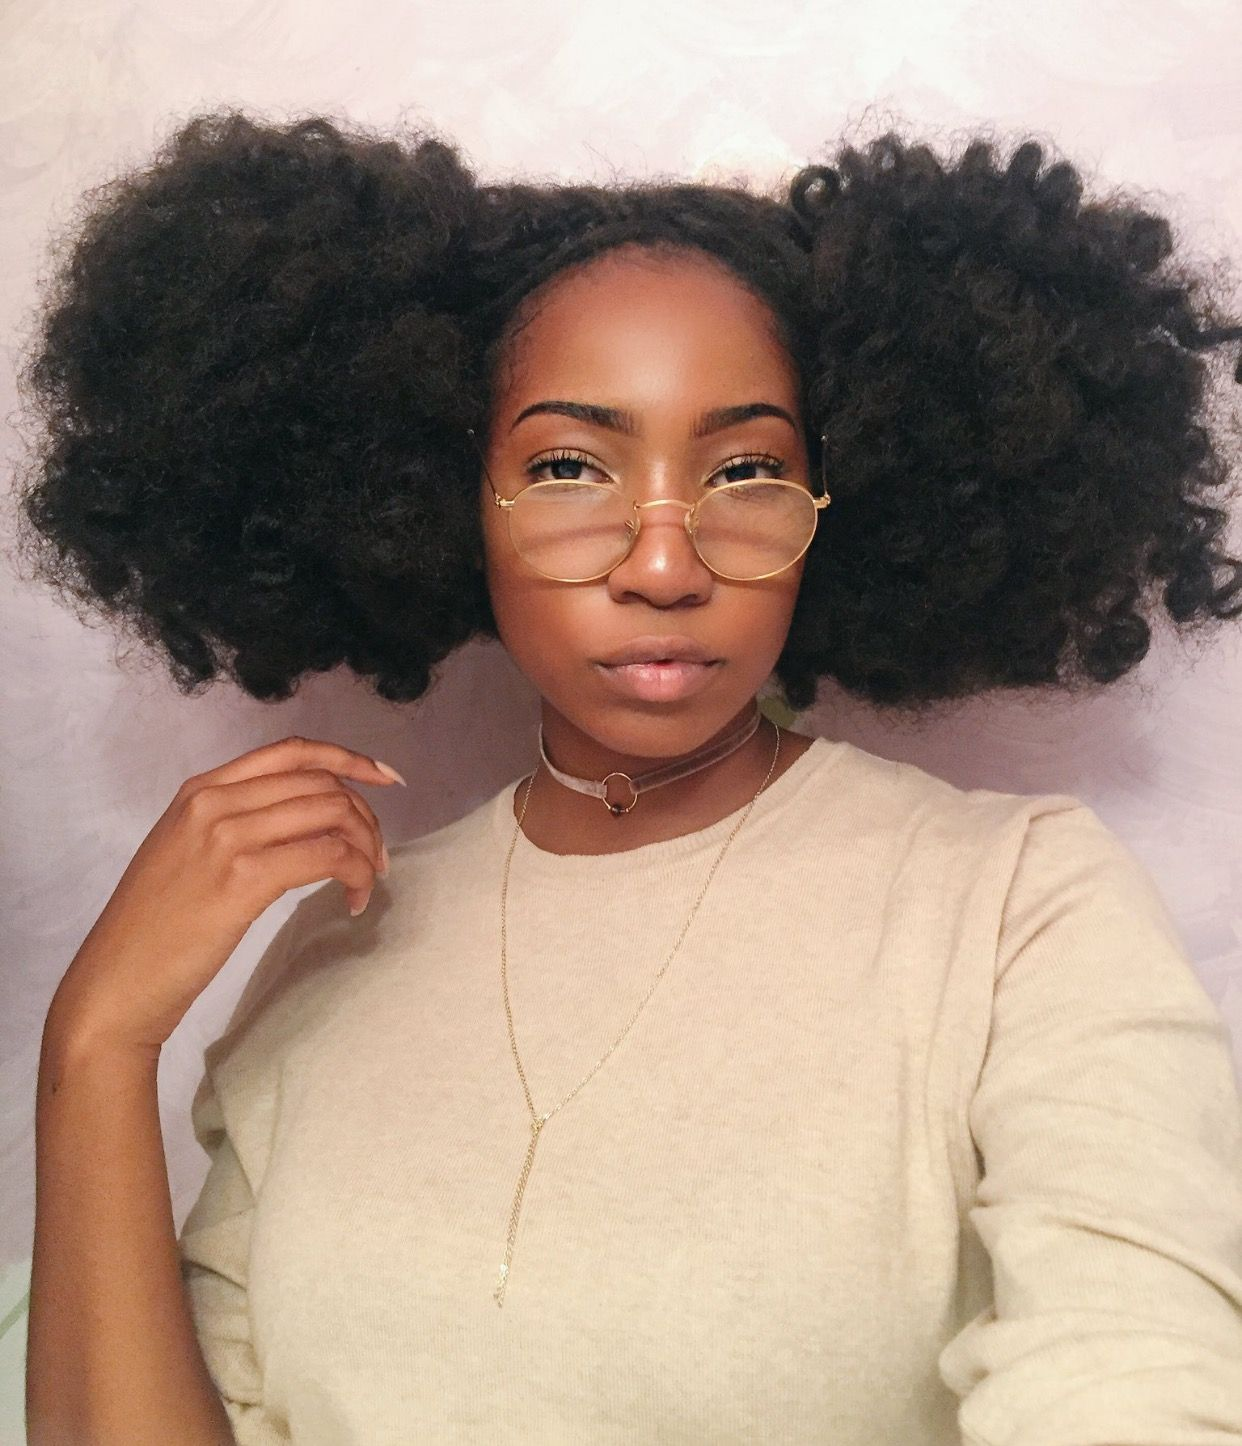 Natural Curly Pigtail Hair Follow Fayelanabell For More Curly Hair Pins Curly Hair Styles Naturally Natural Hair Styles Beautiful Natural Hair